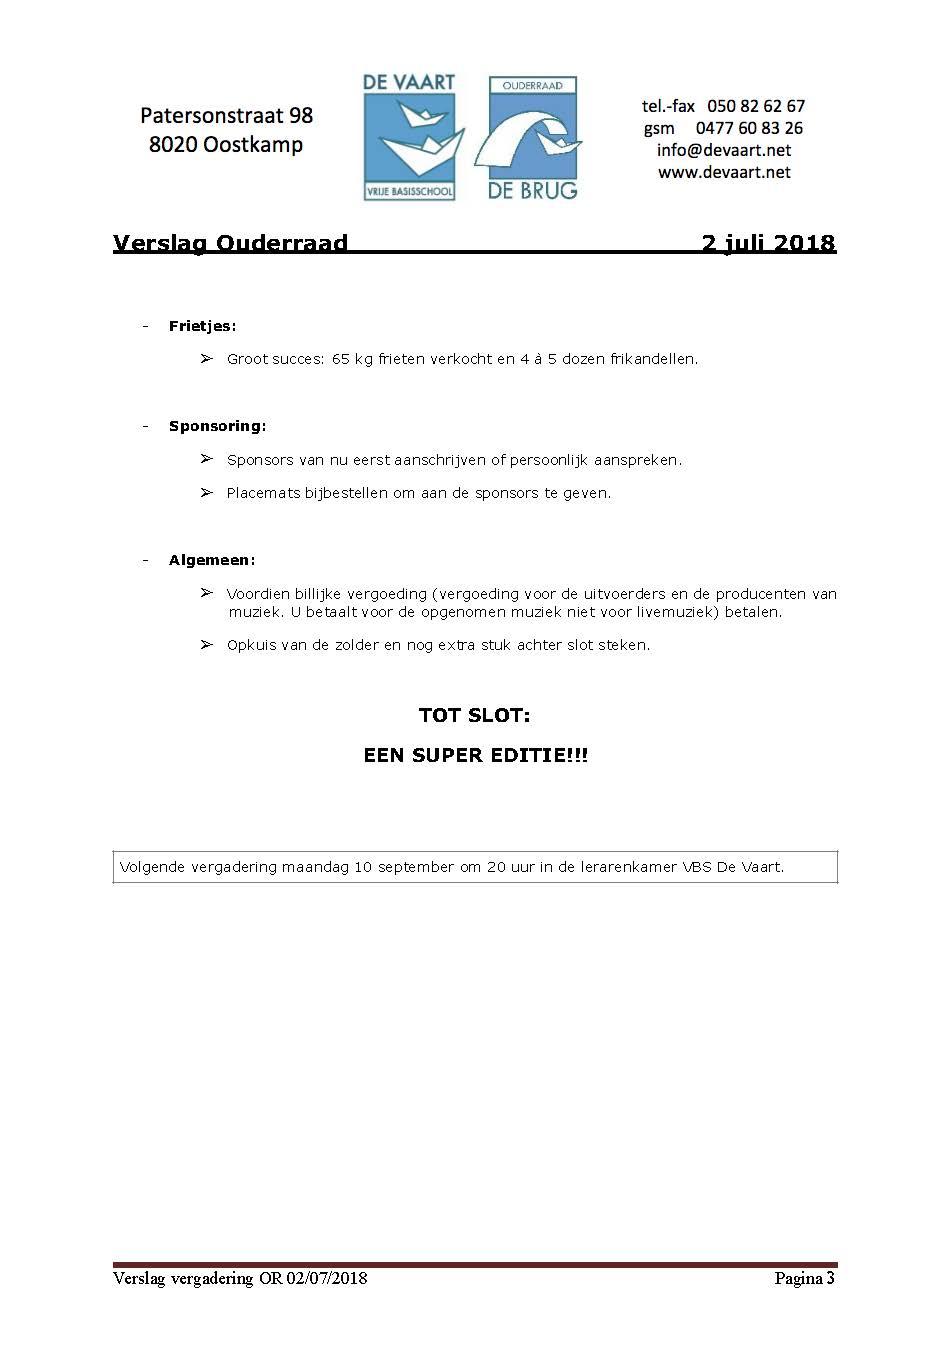 Verslag 2018 - 07 - 02 (evaluatieverslag)_Page_3.jpg